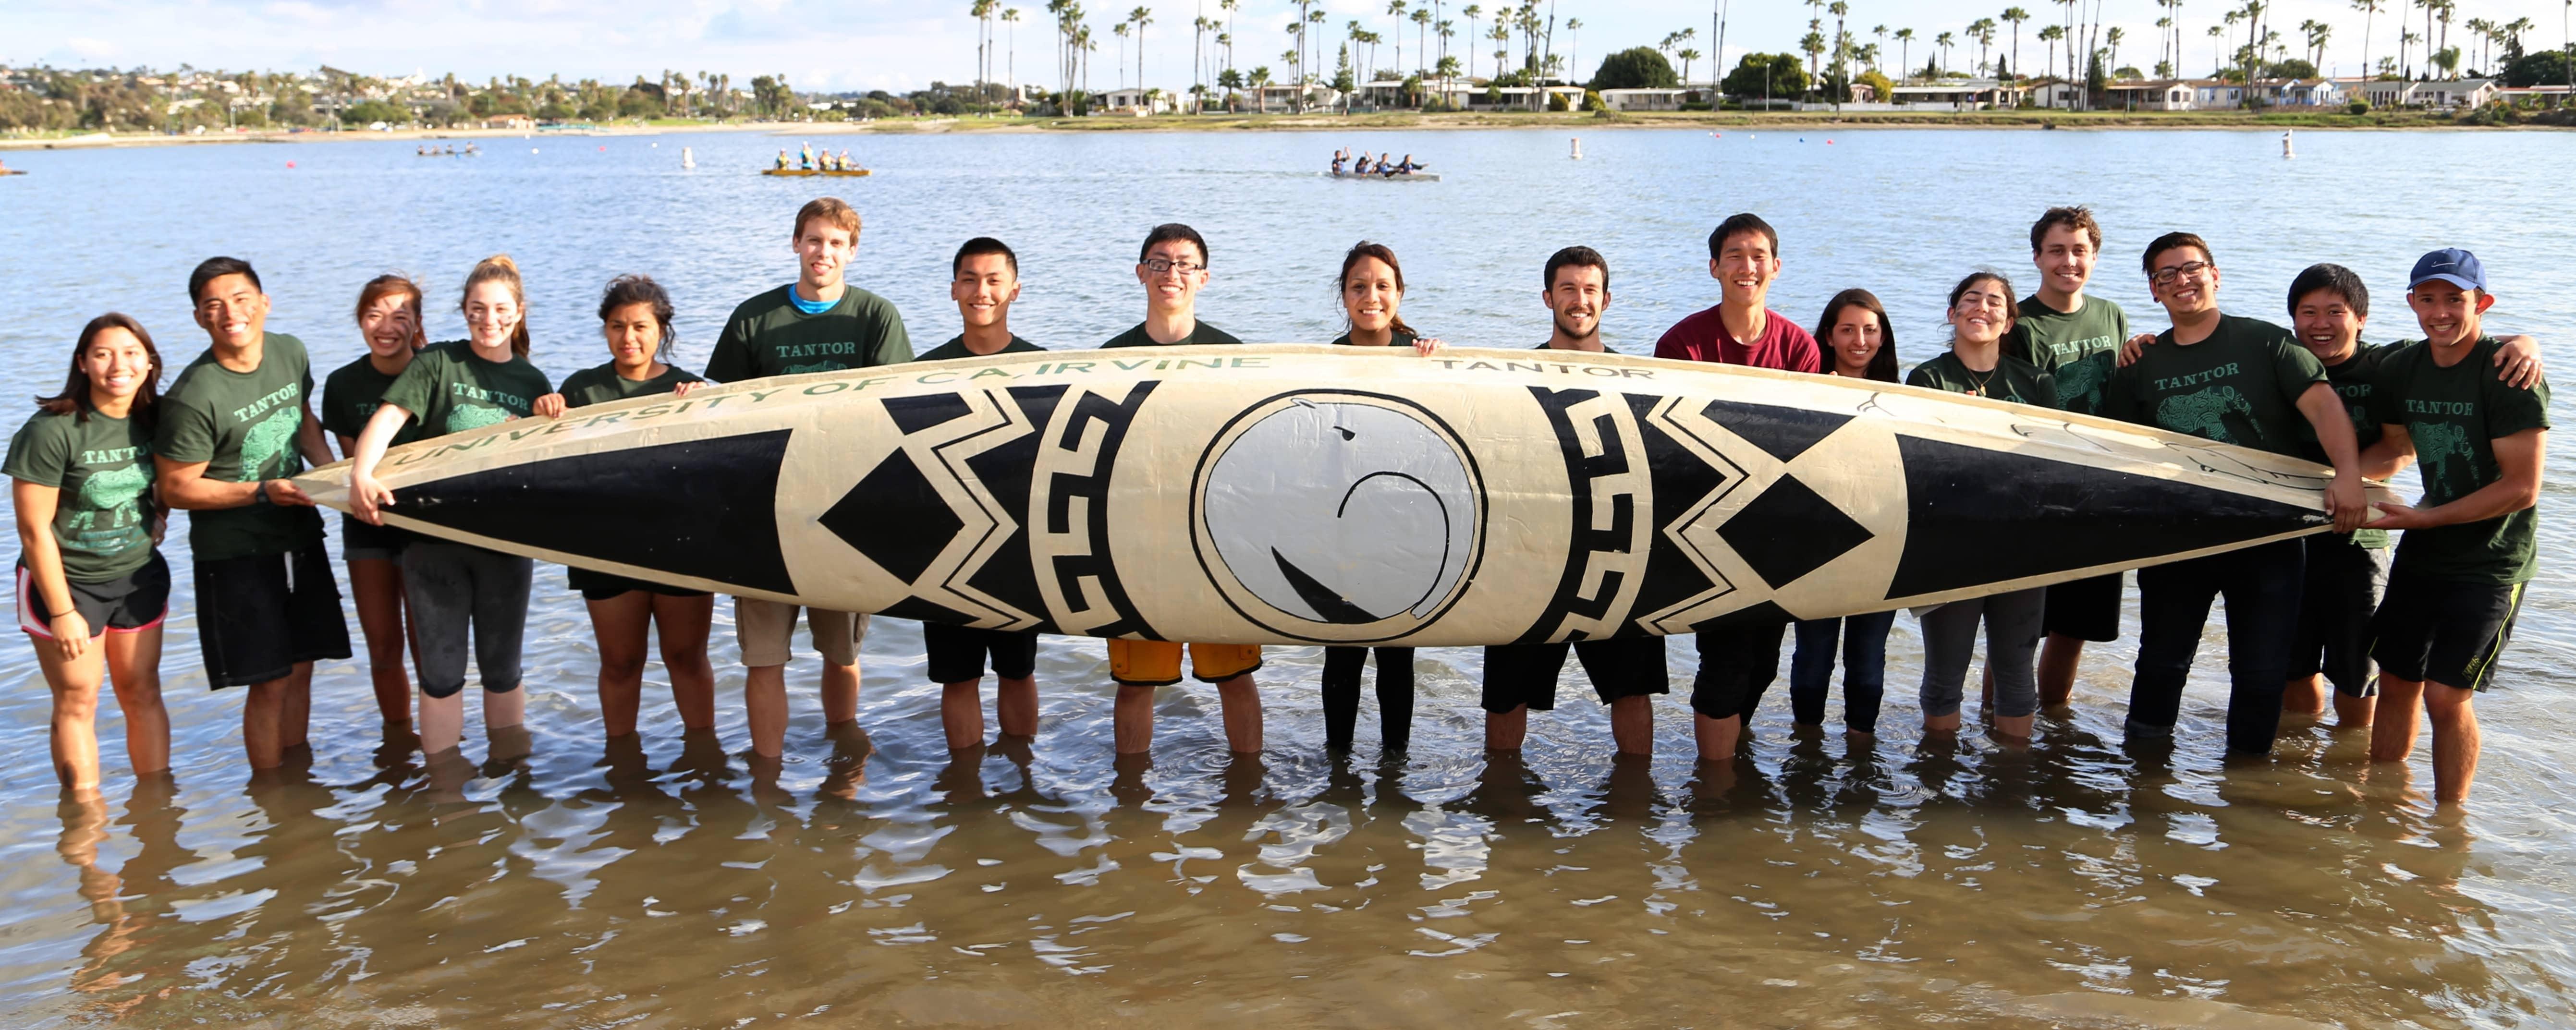 Concrete Canoe Asce Uci